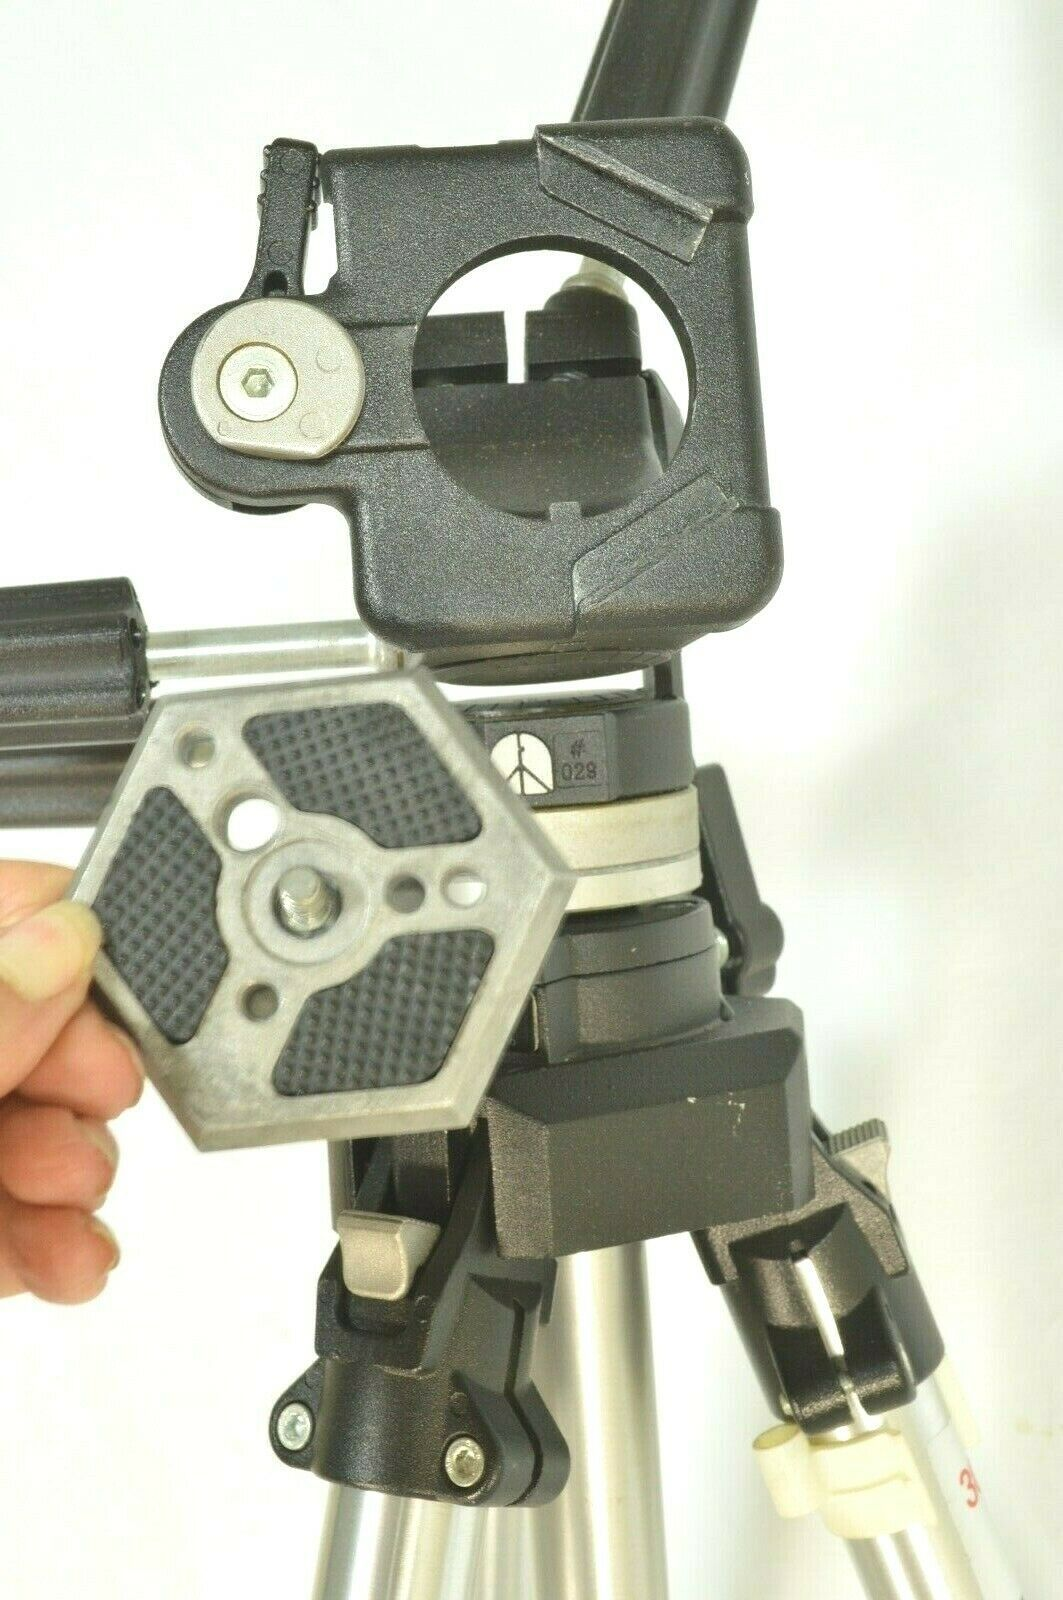 Manfrotto Bogen 3021 pro camera tripod +3047 Deluxe 3-way Pan/tilt Head image 7